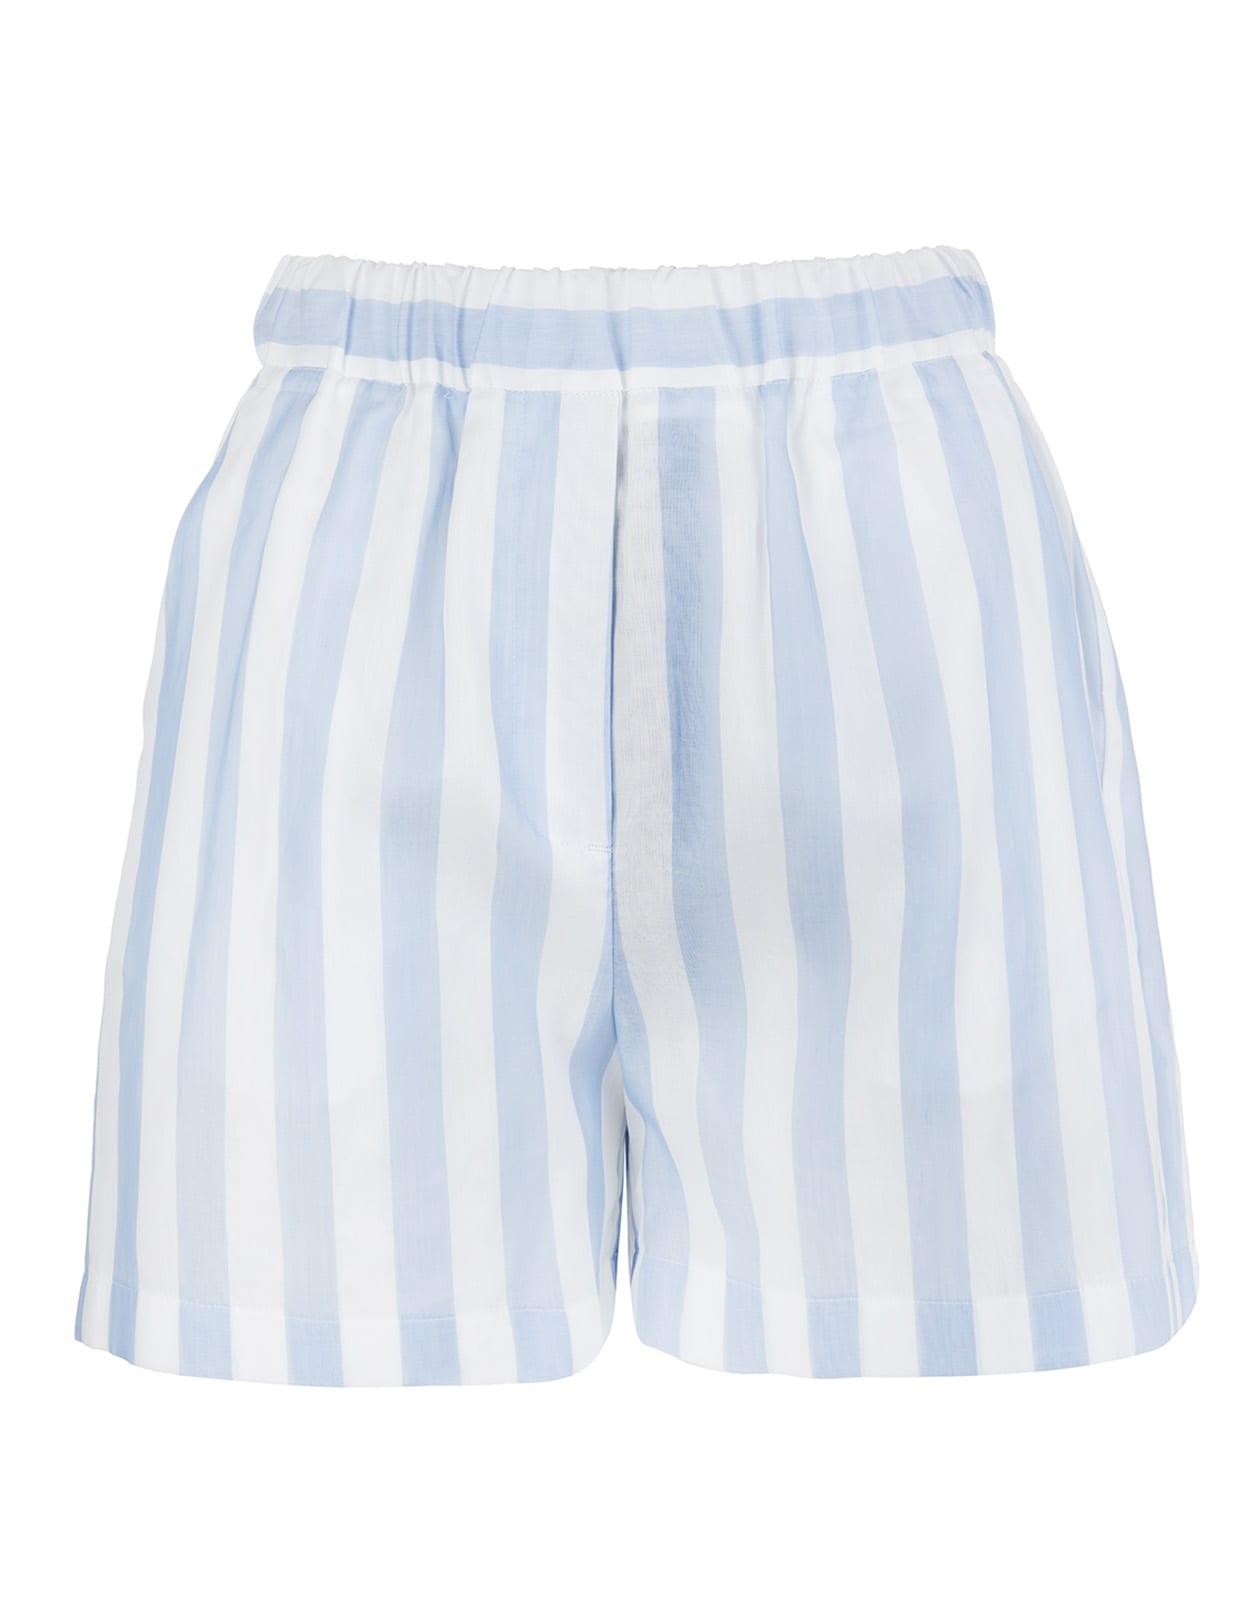 Stripe Pattern Shorts